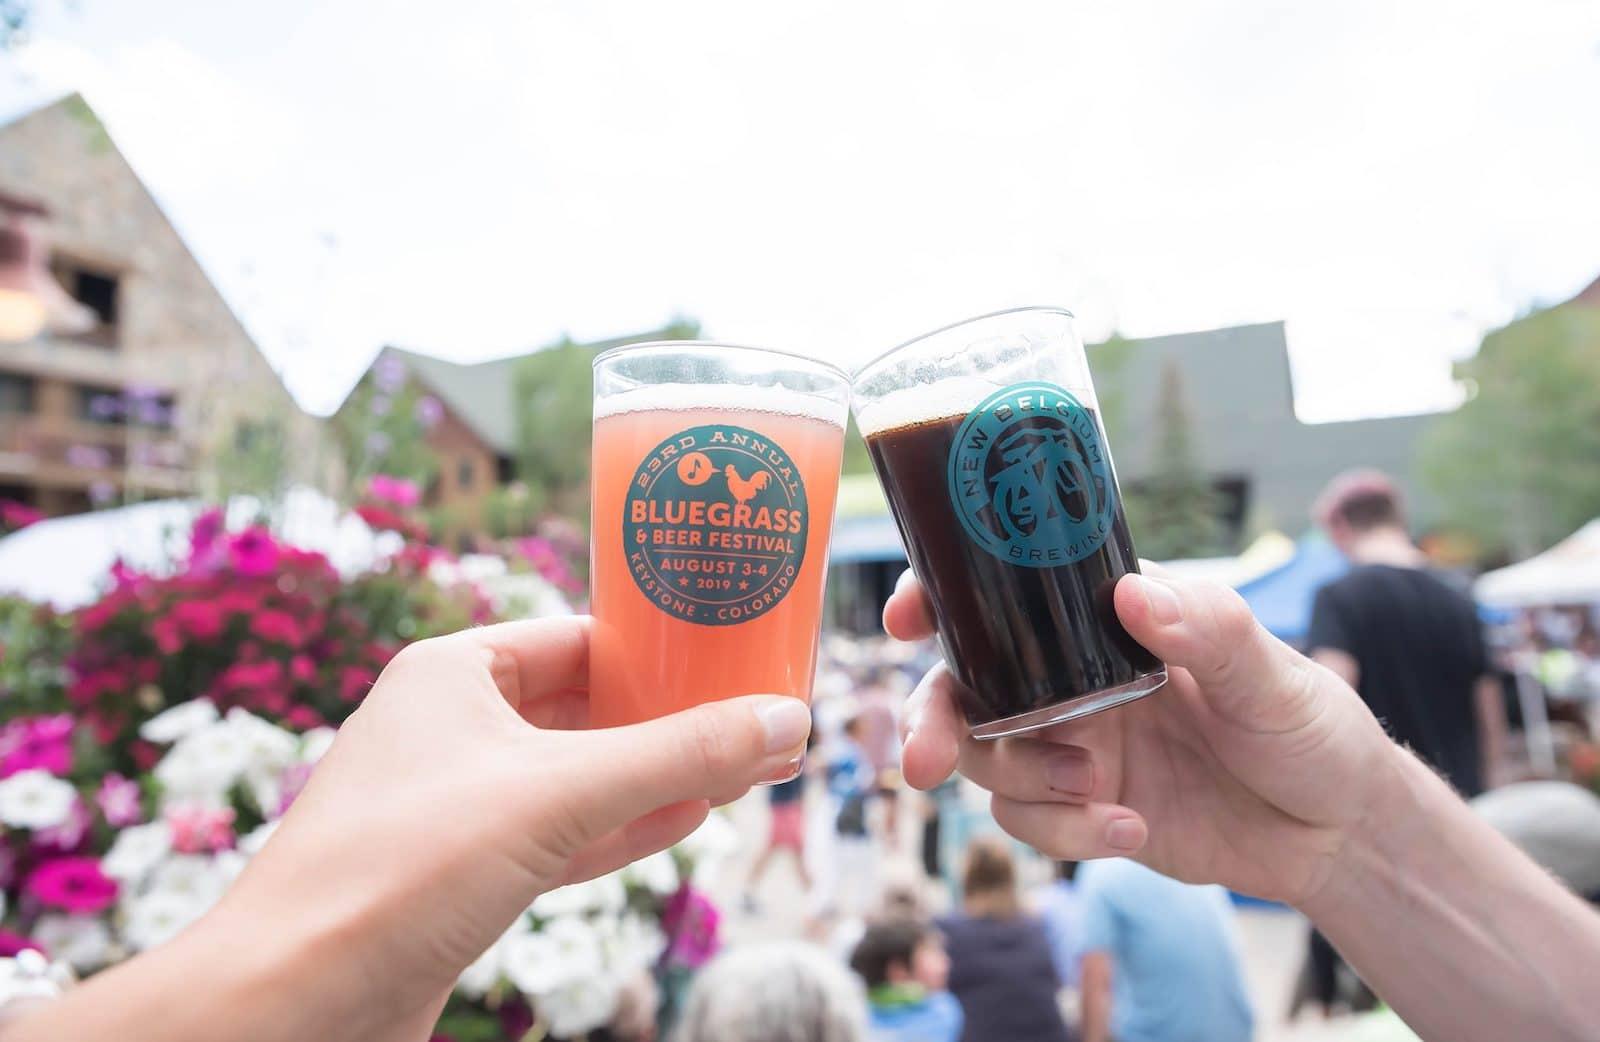 Gambar dua gelas di Bluegrass and Beer Festival di Keystone, Colorado